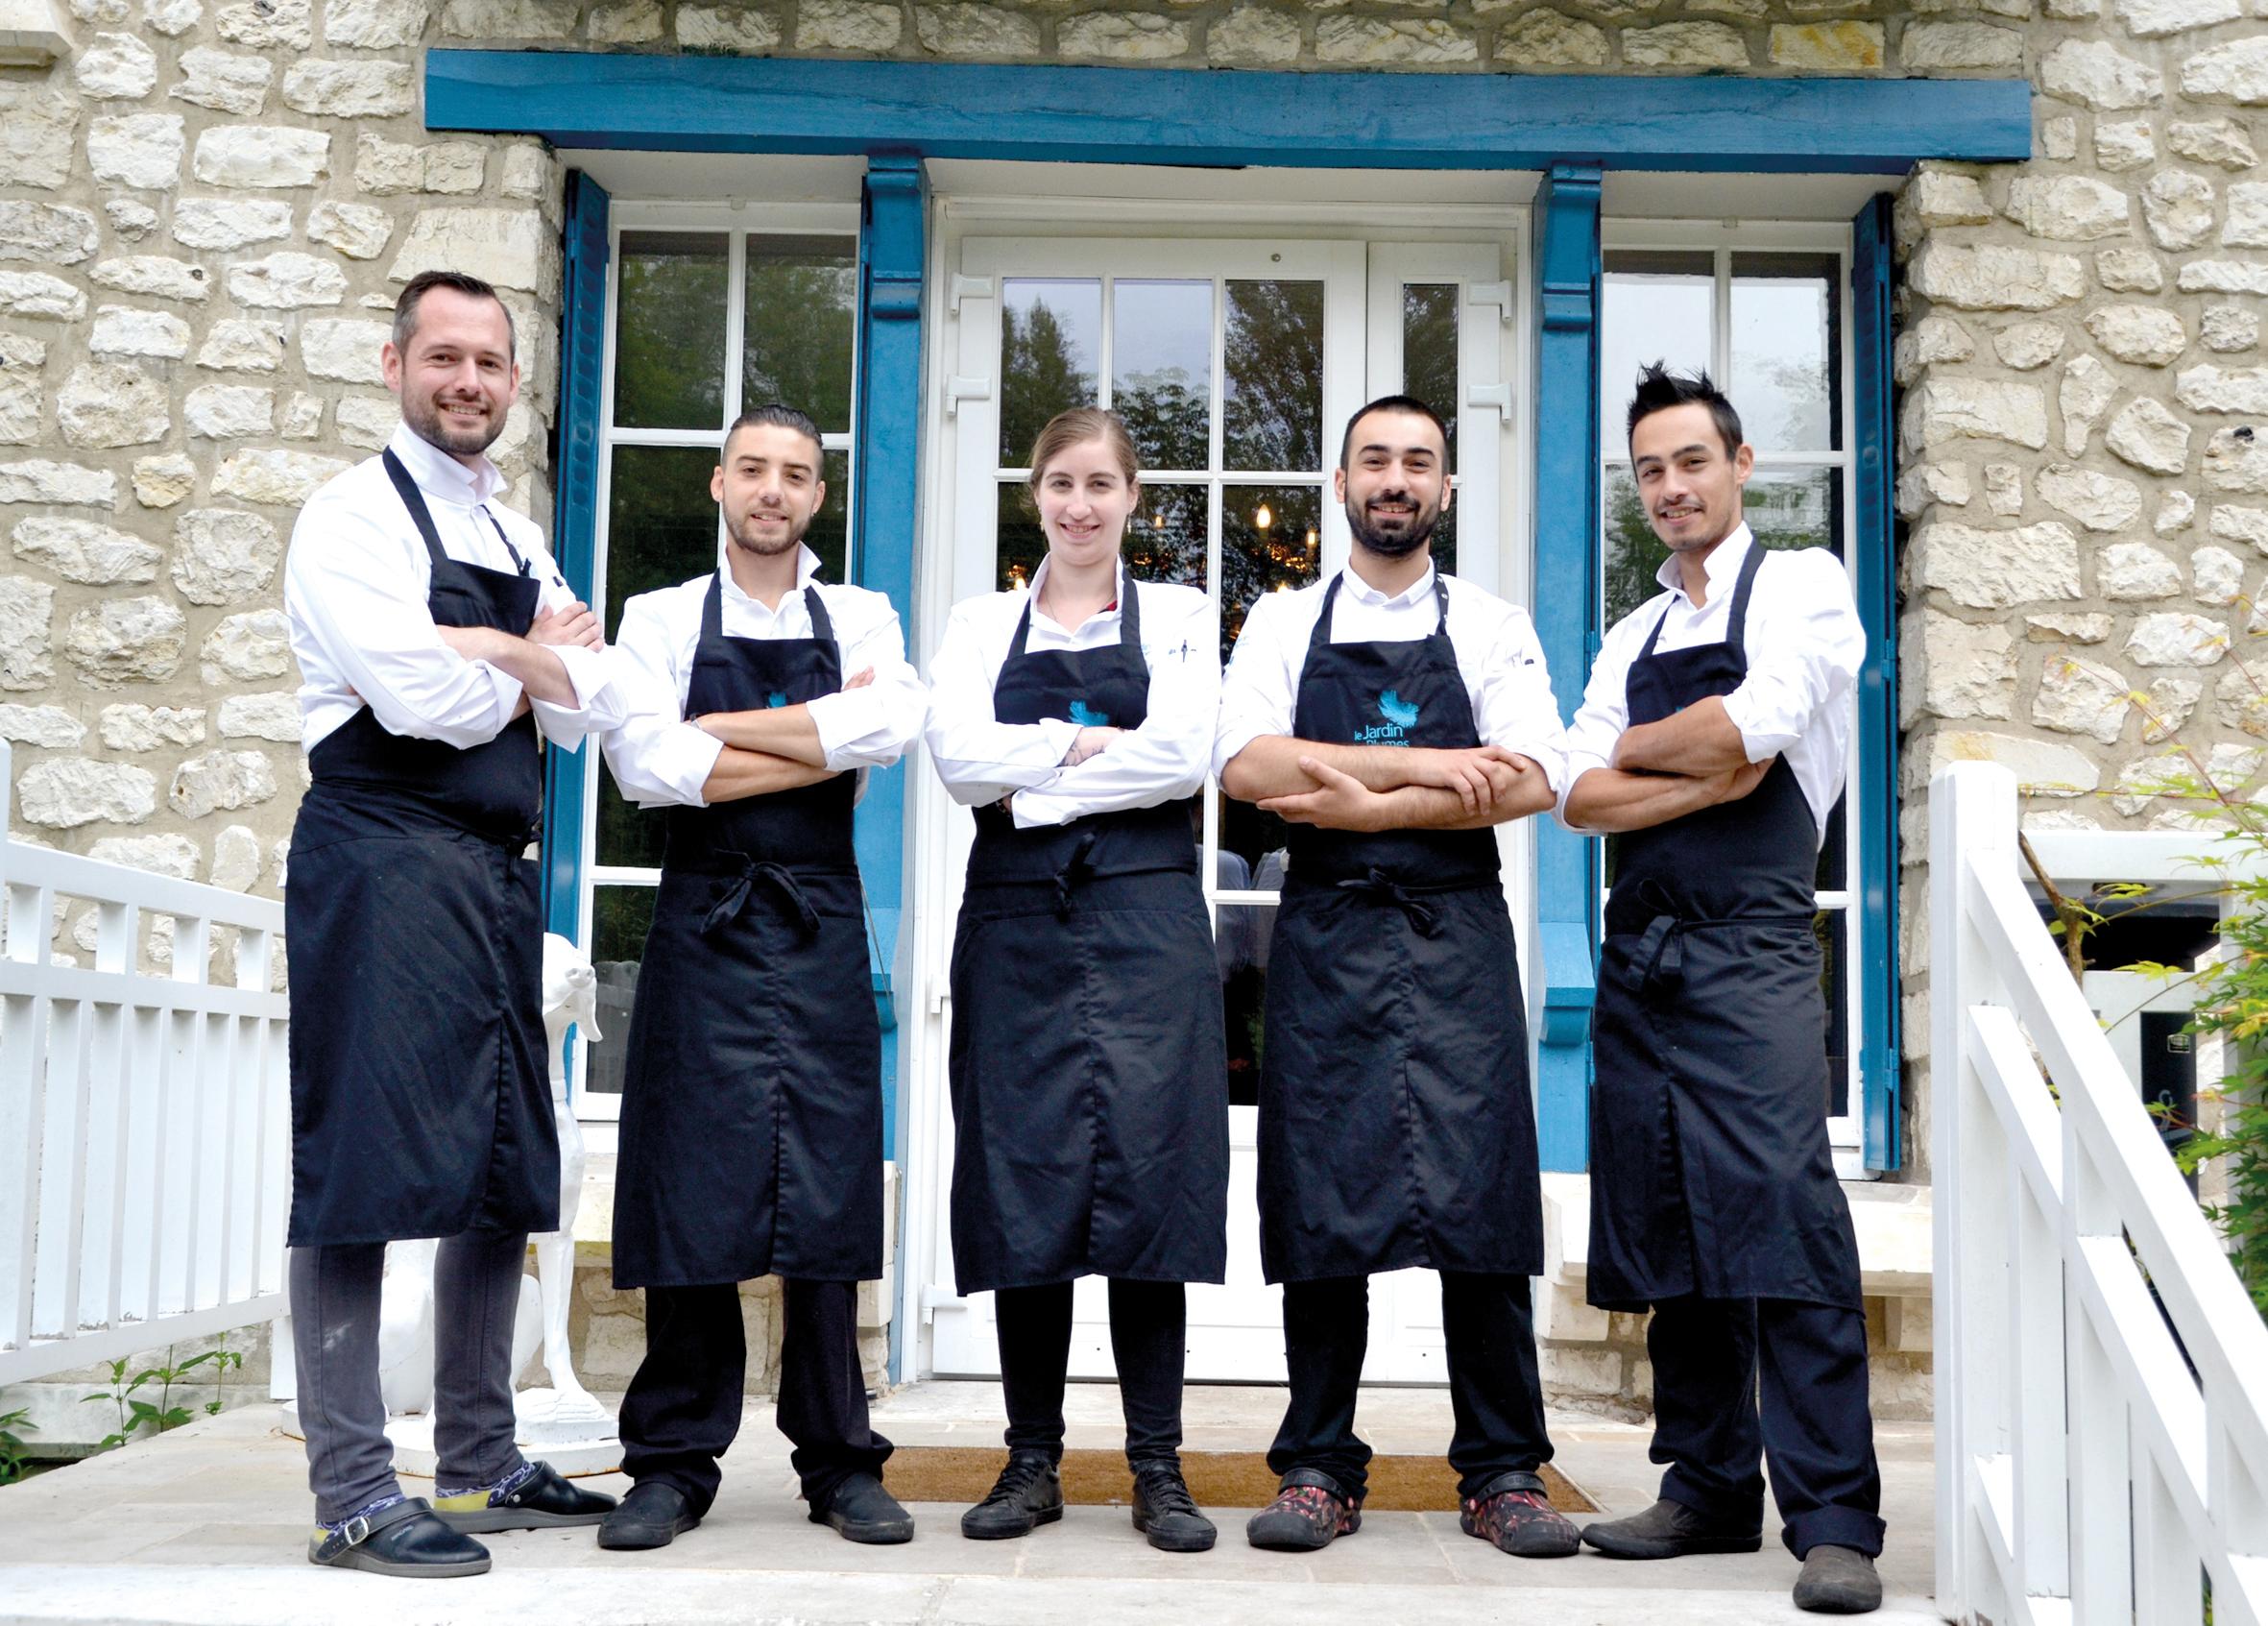 Vernon direct david gallienne chef de cuisine - Direct cuisine ...